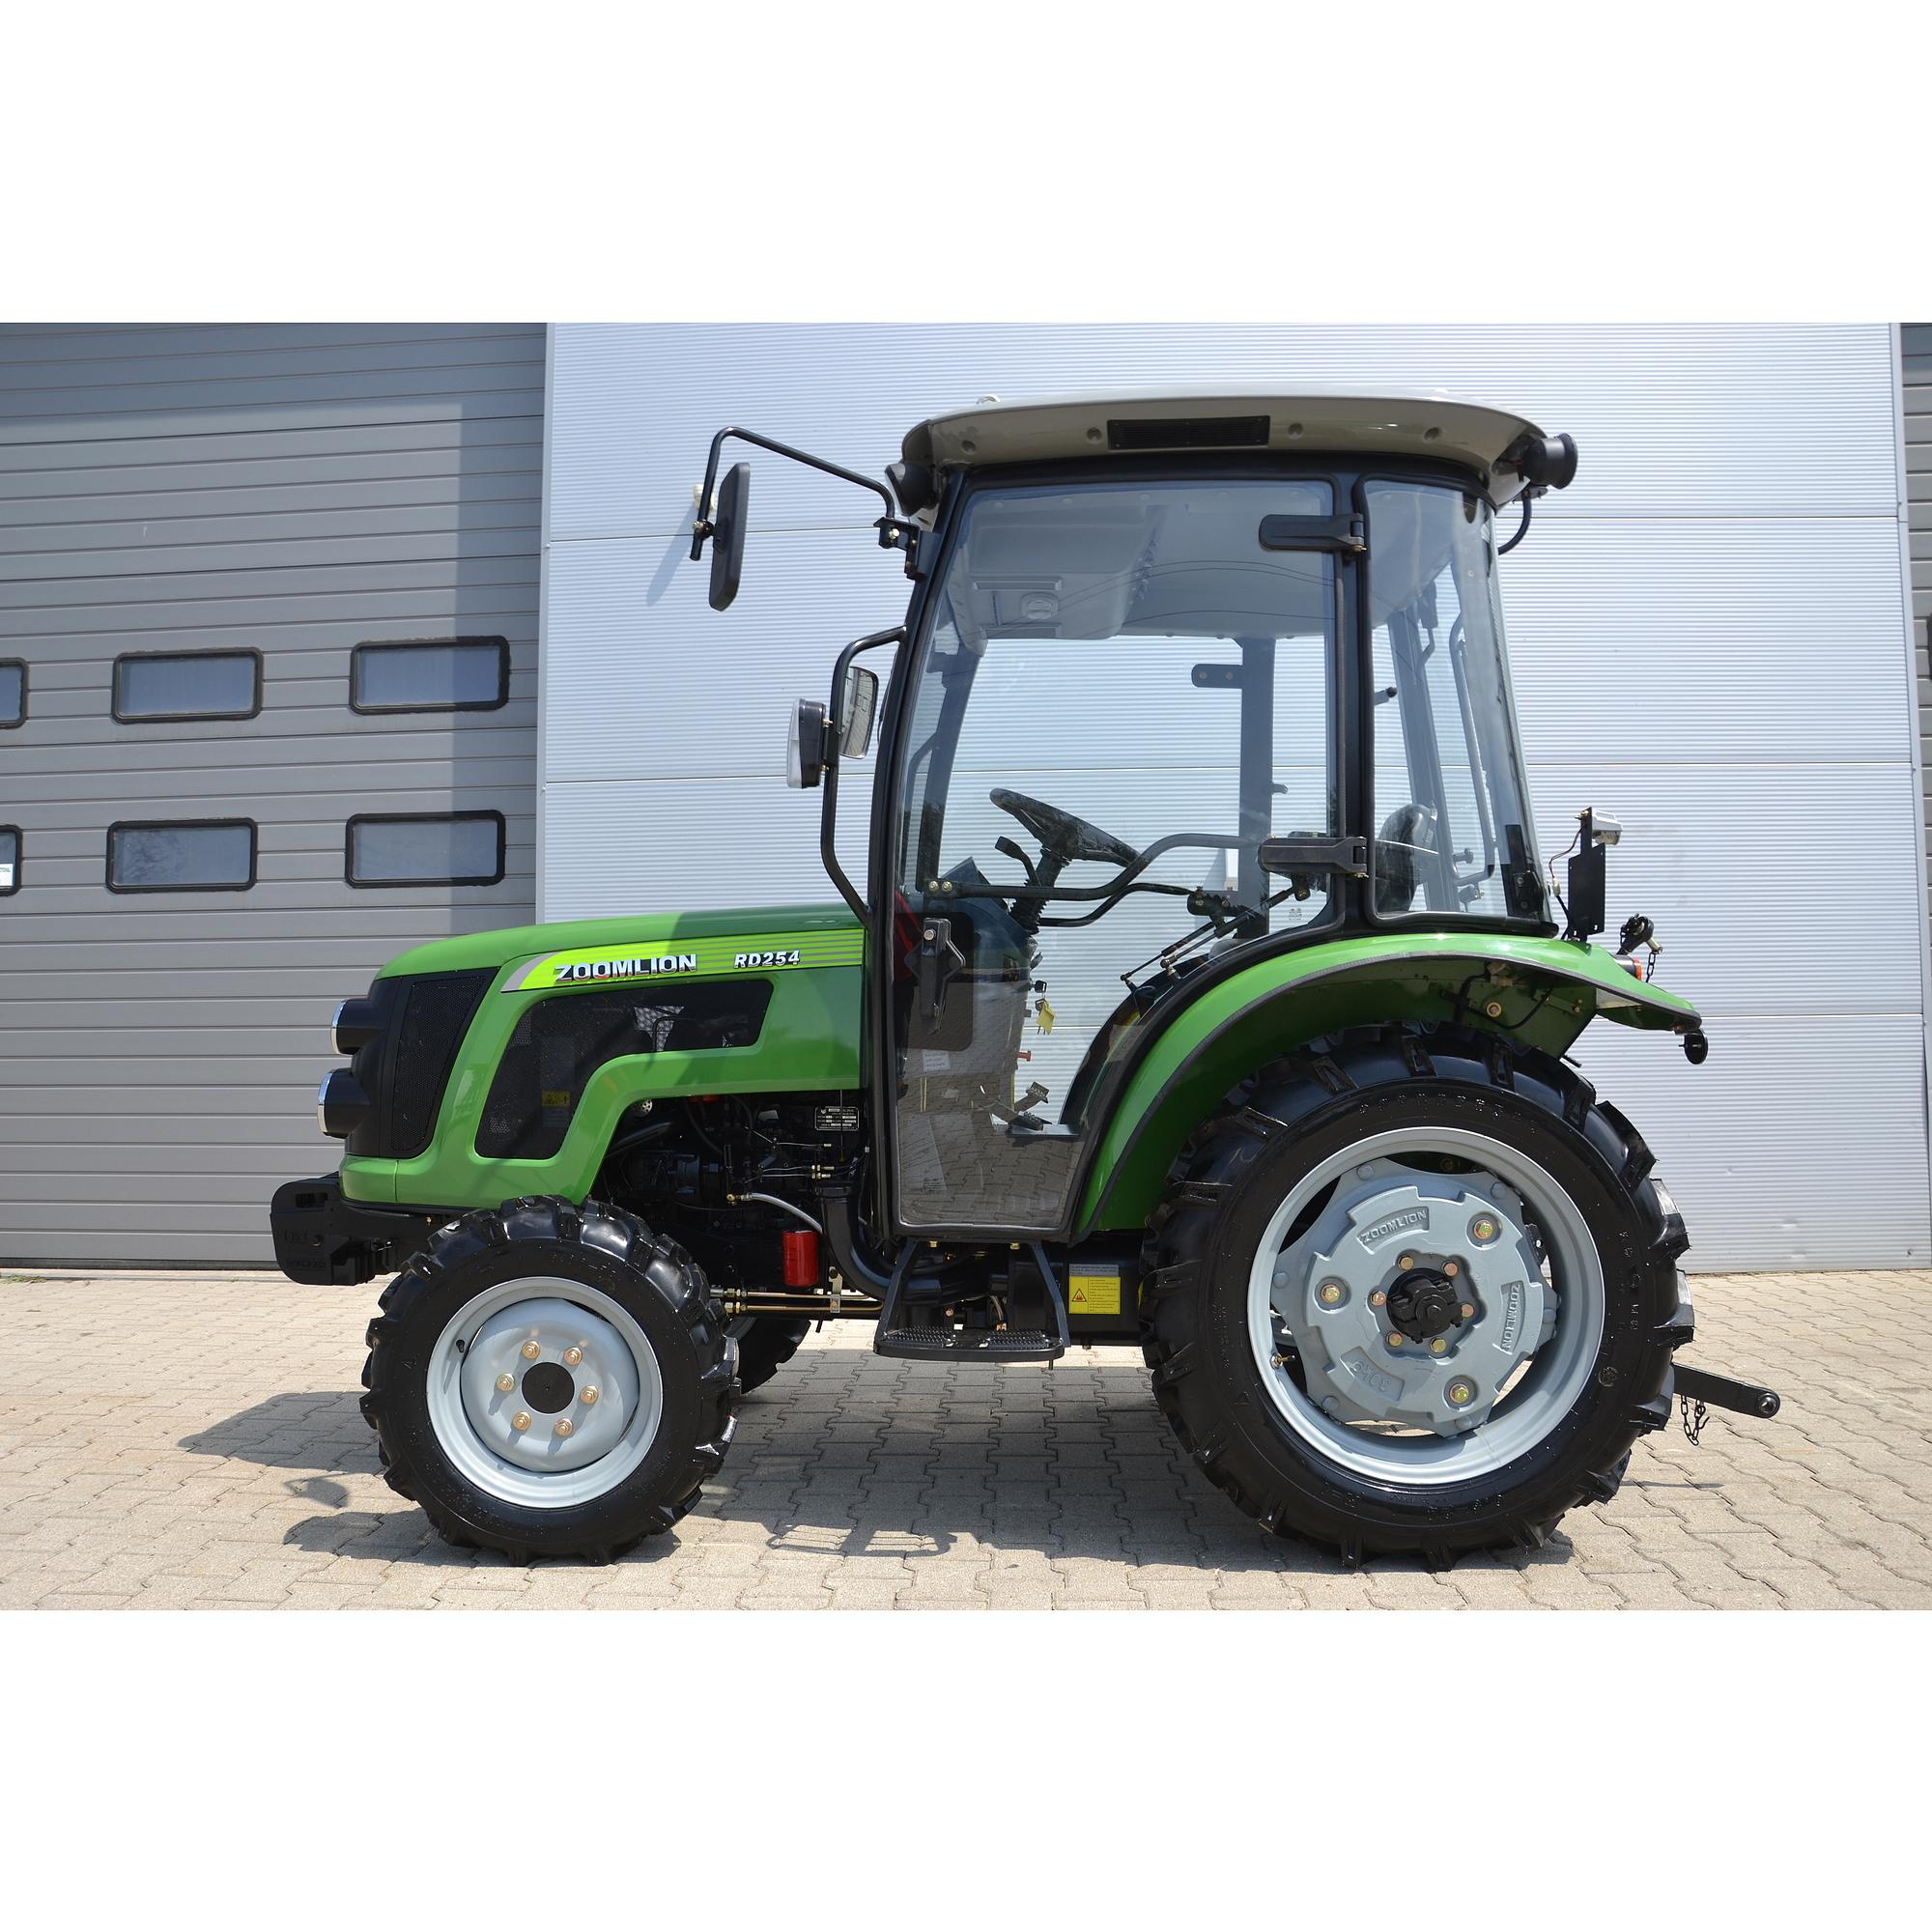 zoomlion-traktor-25-le-fulkes-rd254-6